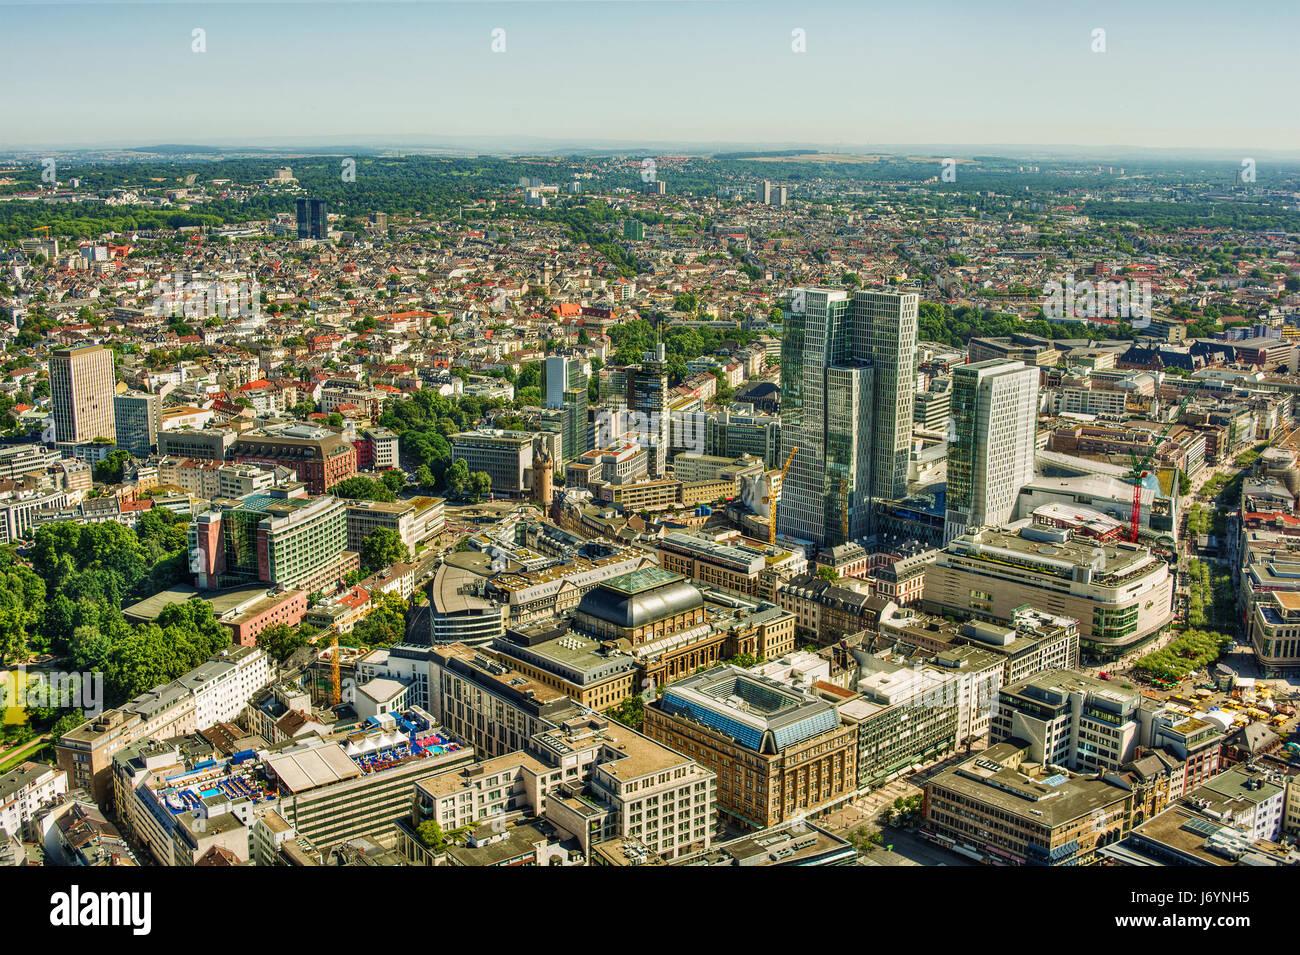 City skyline, Frankfurt am Main, Germany Stock Photo